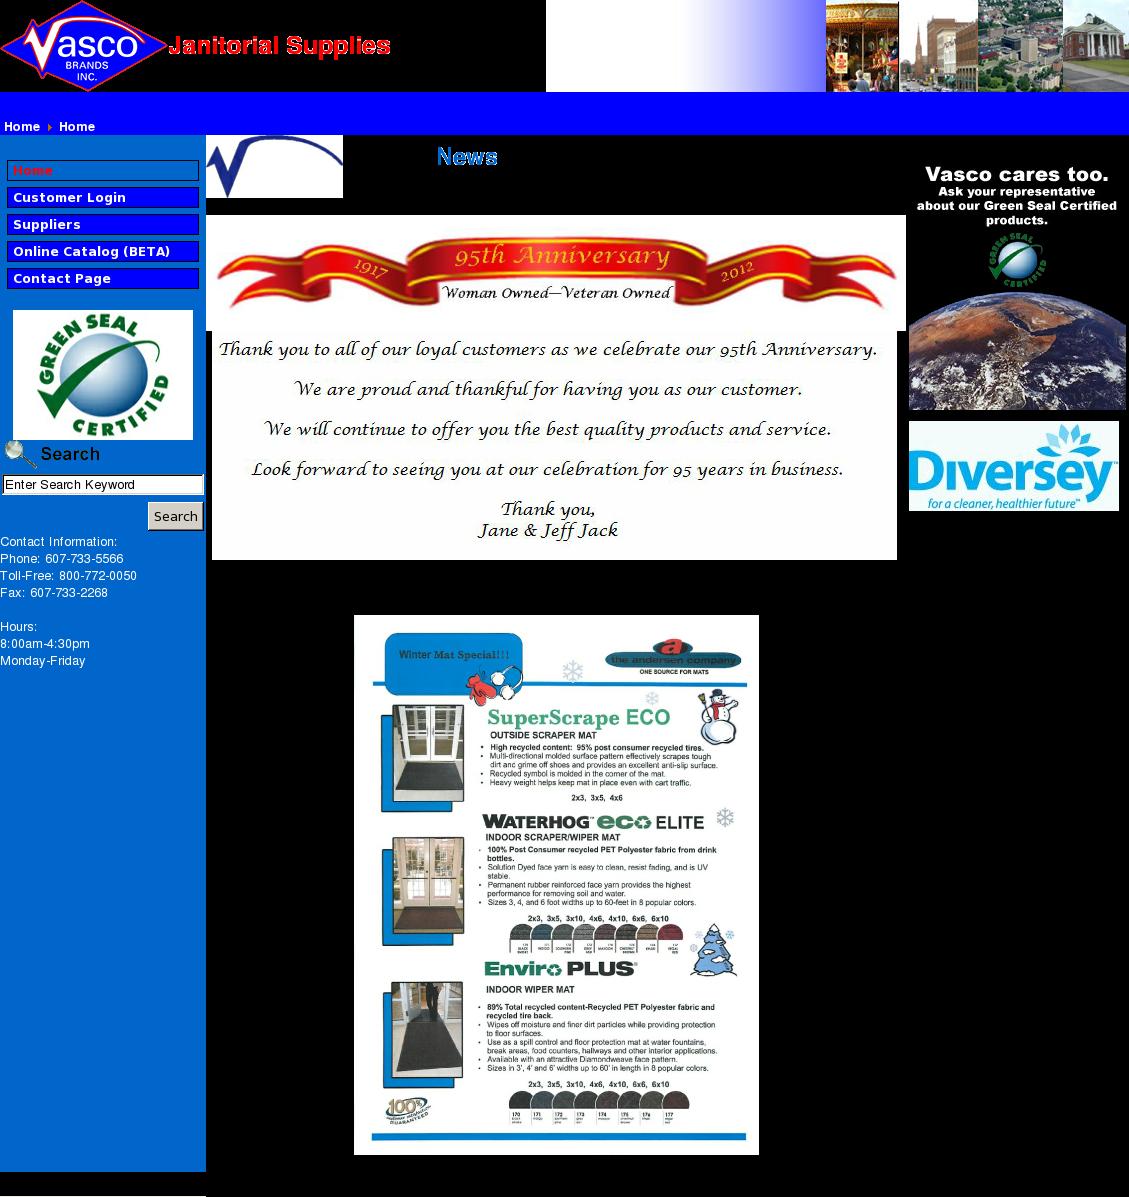 Vasco brands Competitors, Revenue and Employees